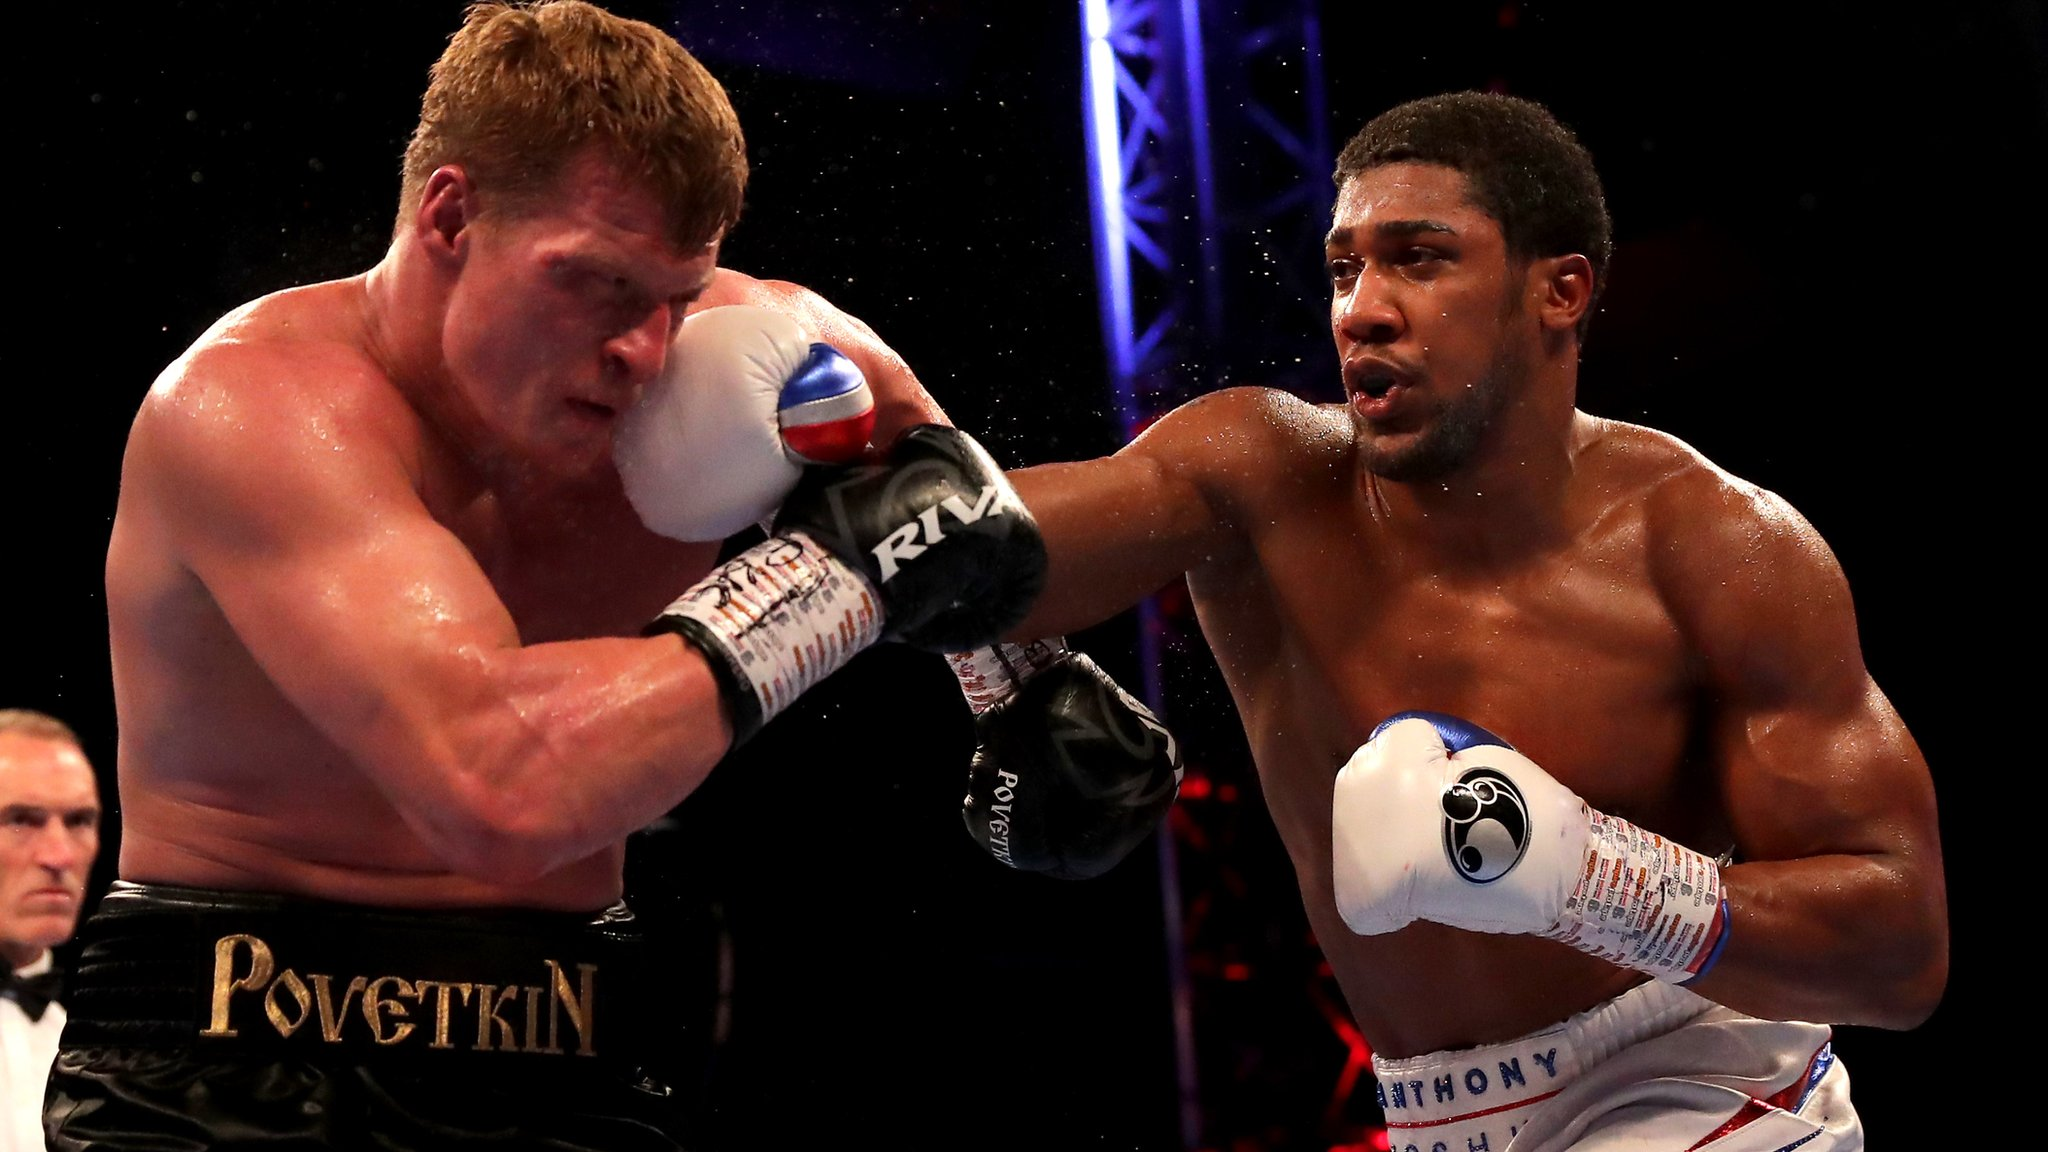 Anthony Joshua stops Alexander Povetkin to retain world heavyweight titles